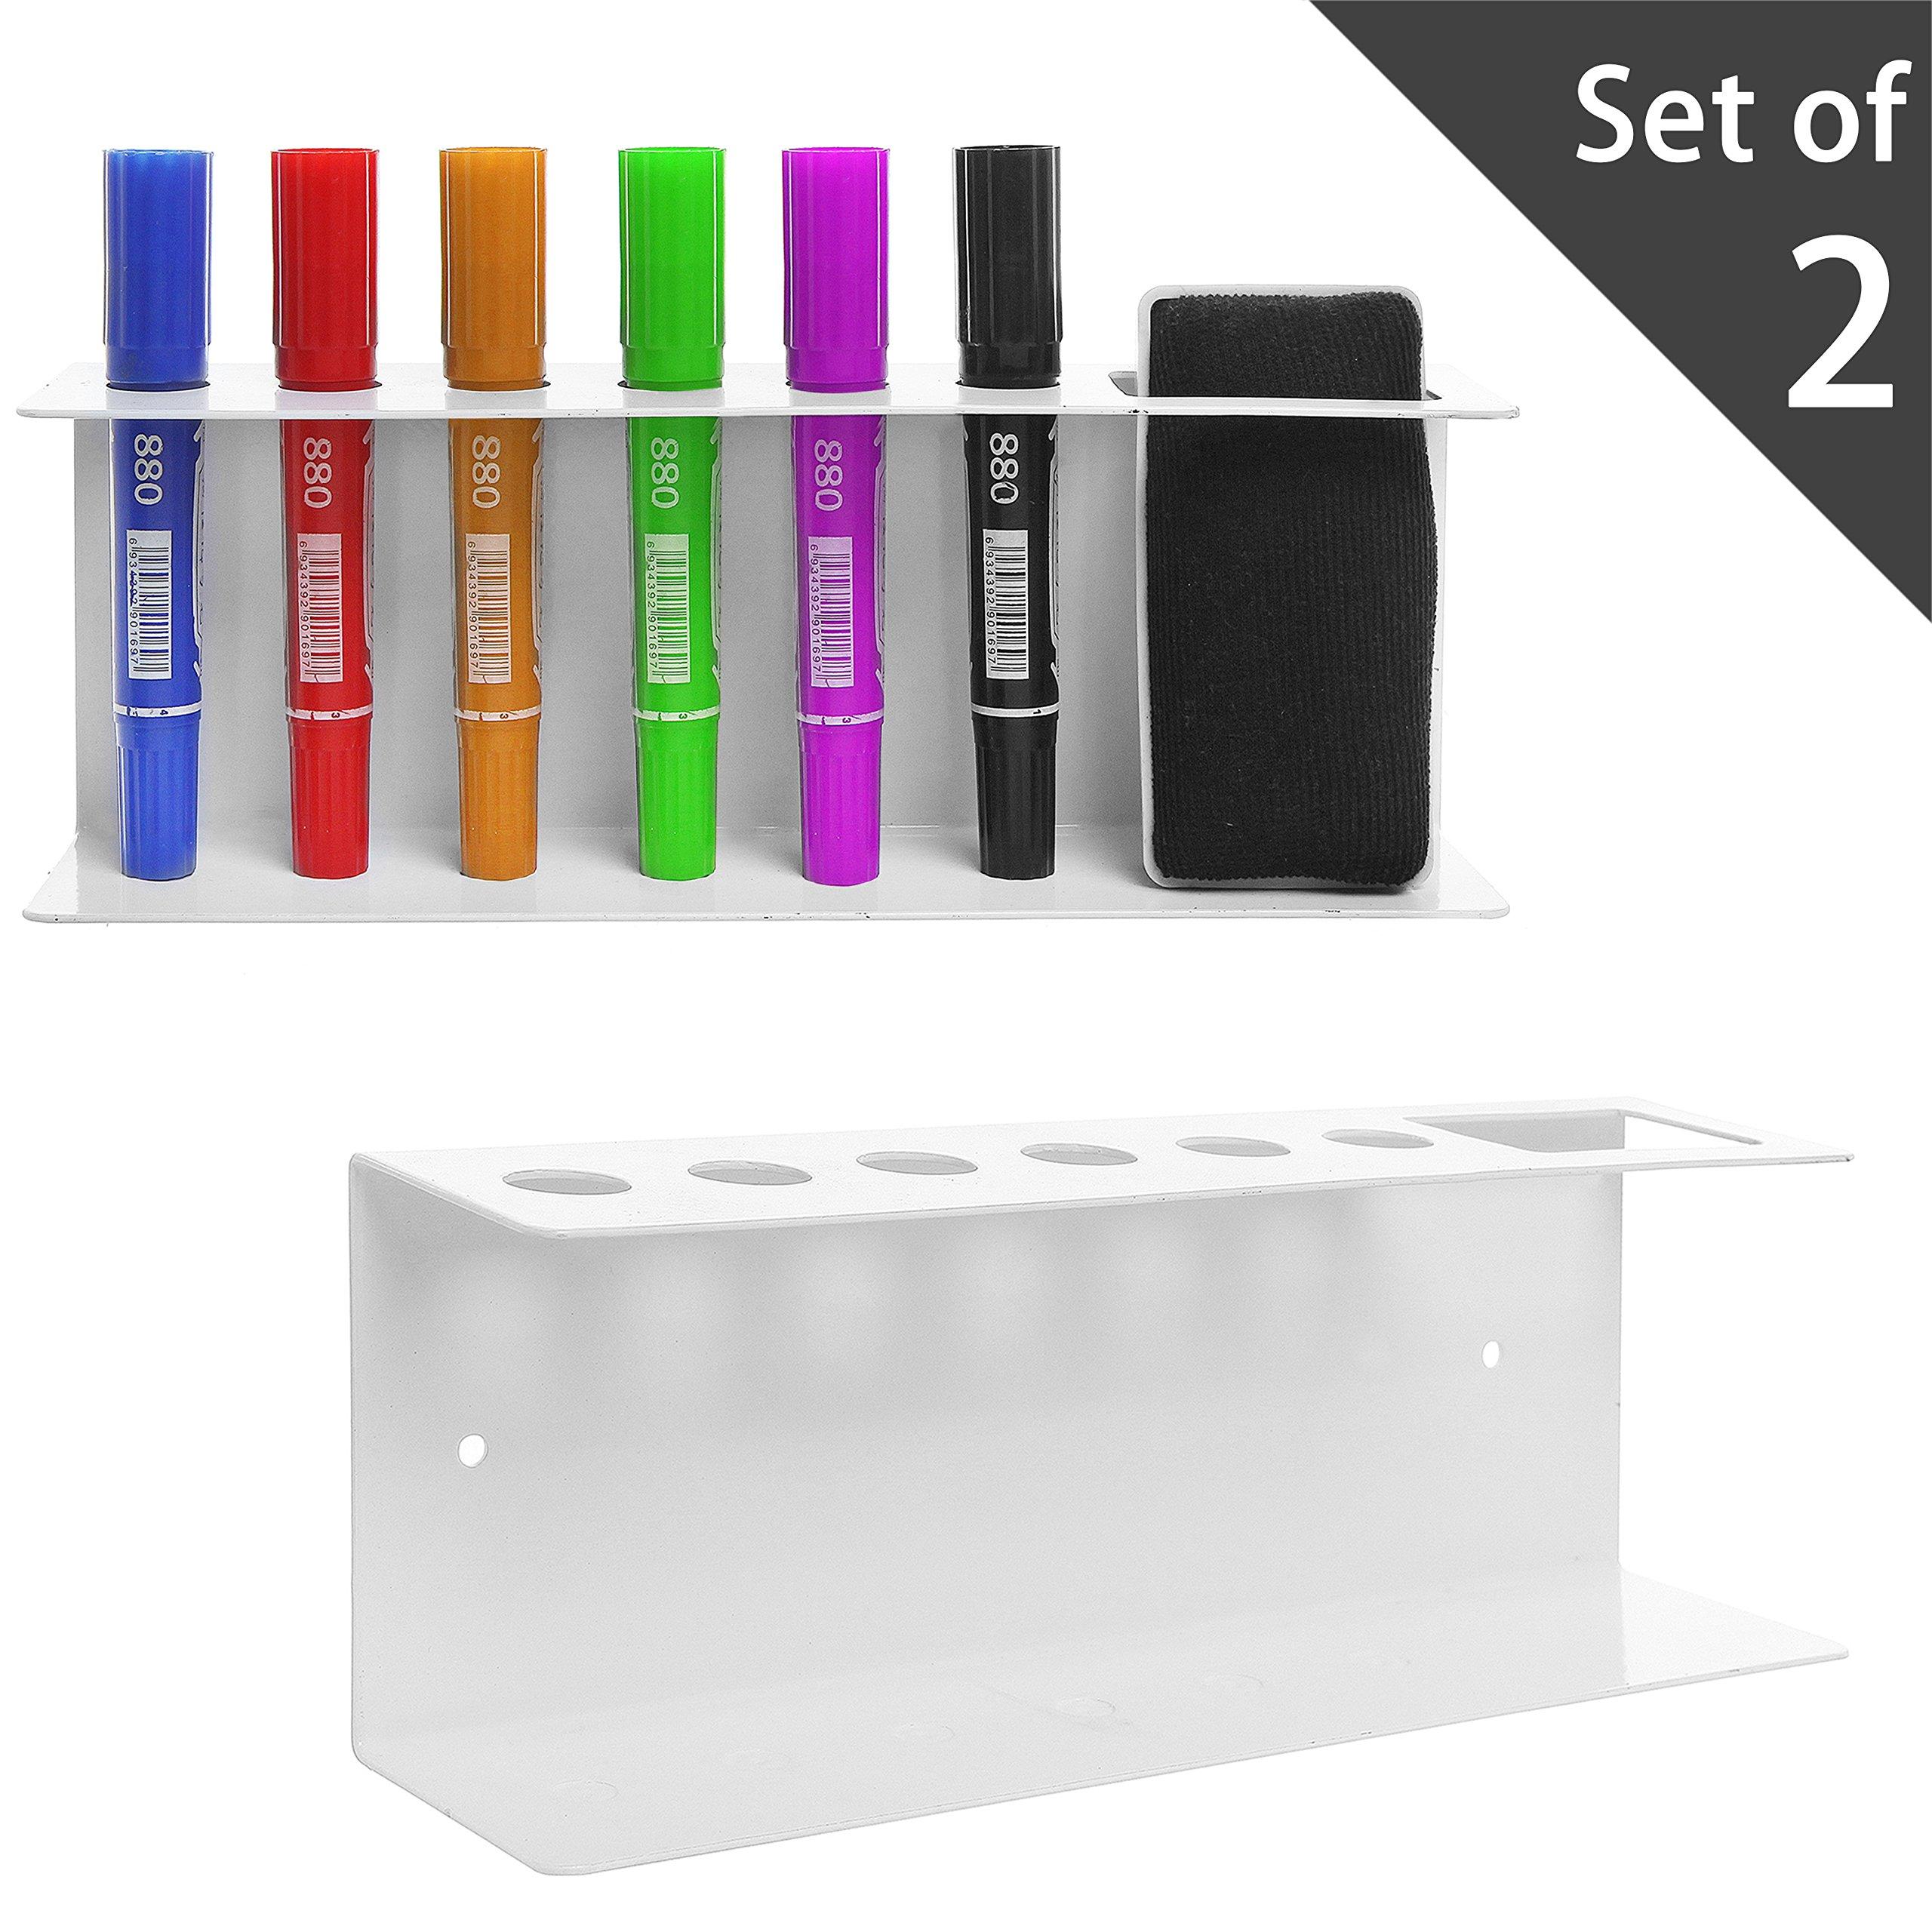 Set of 2 Wall Mountable Metal Dry Erase Whiteboard Marker & Eraser Holder Tray, White